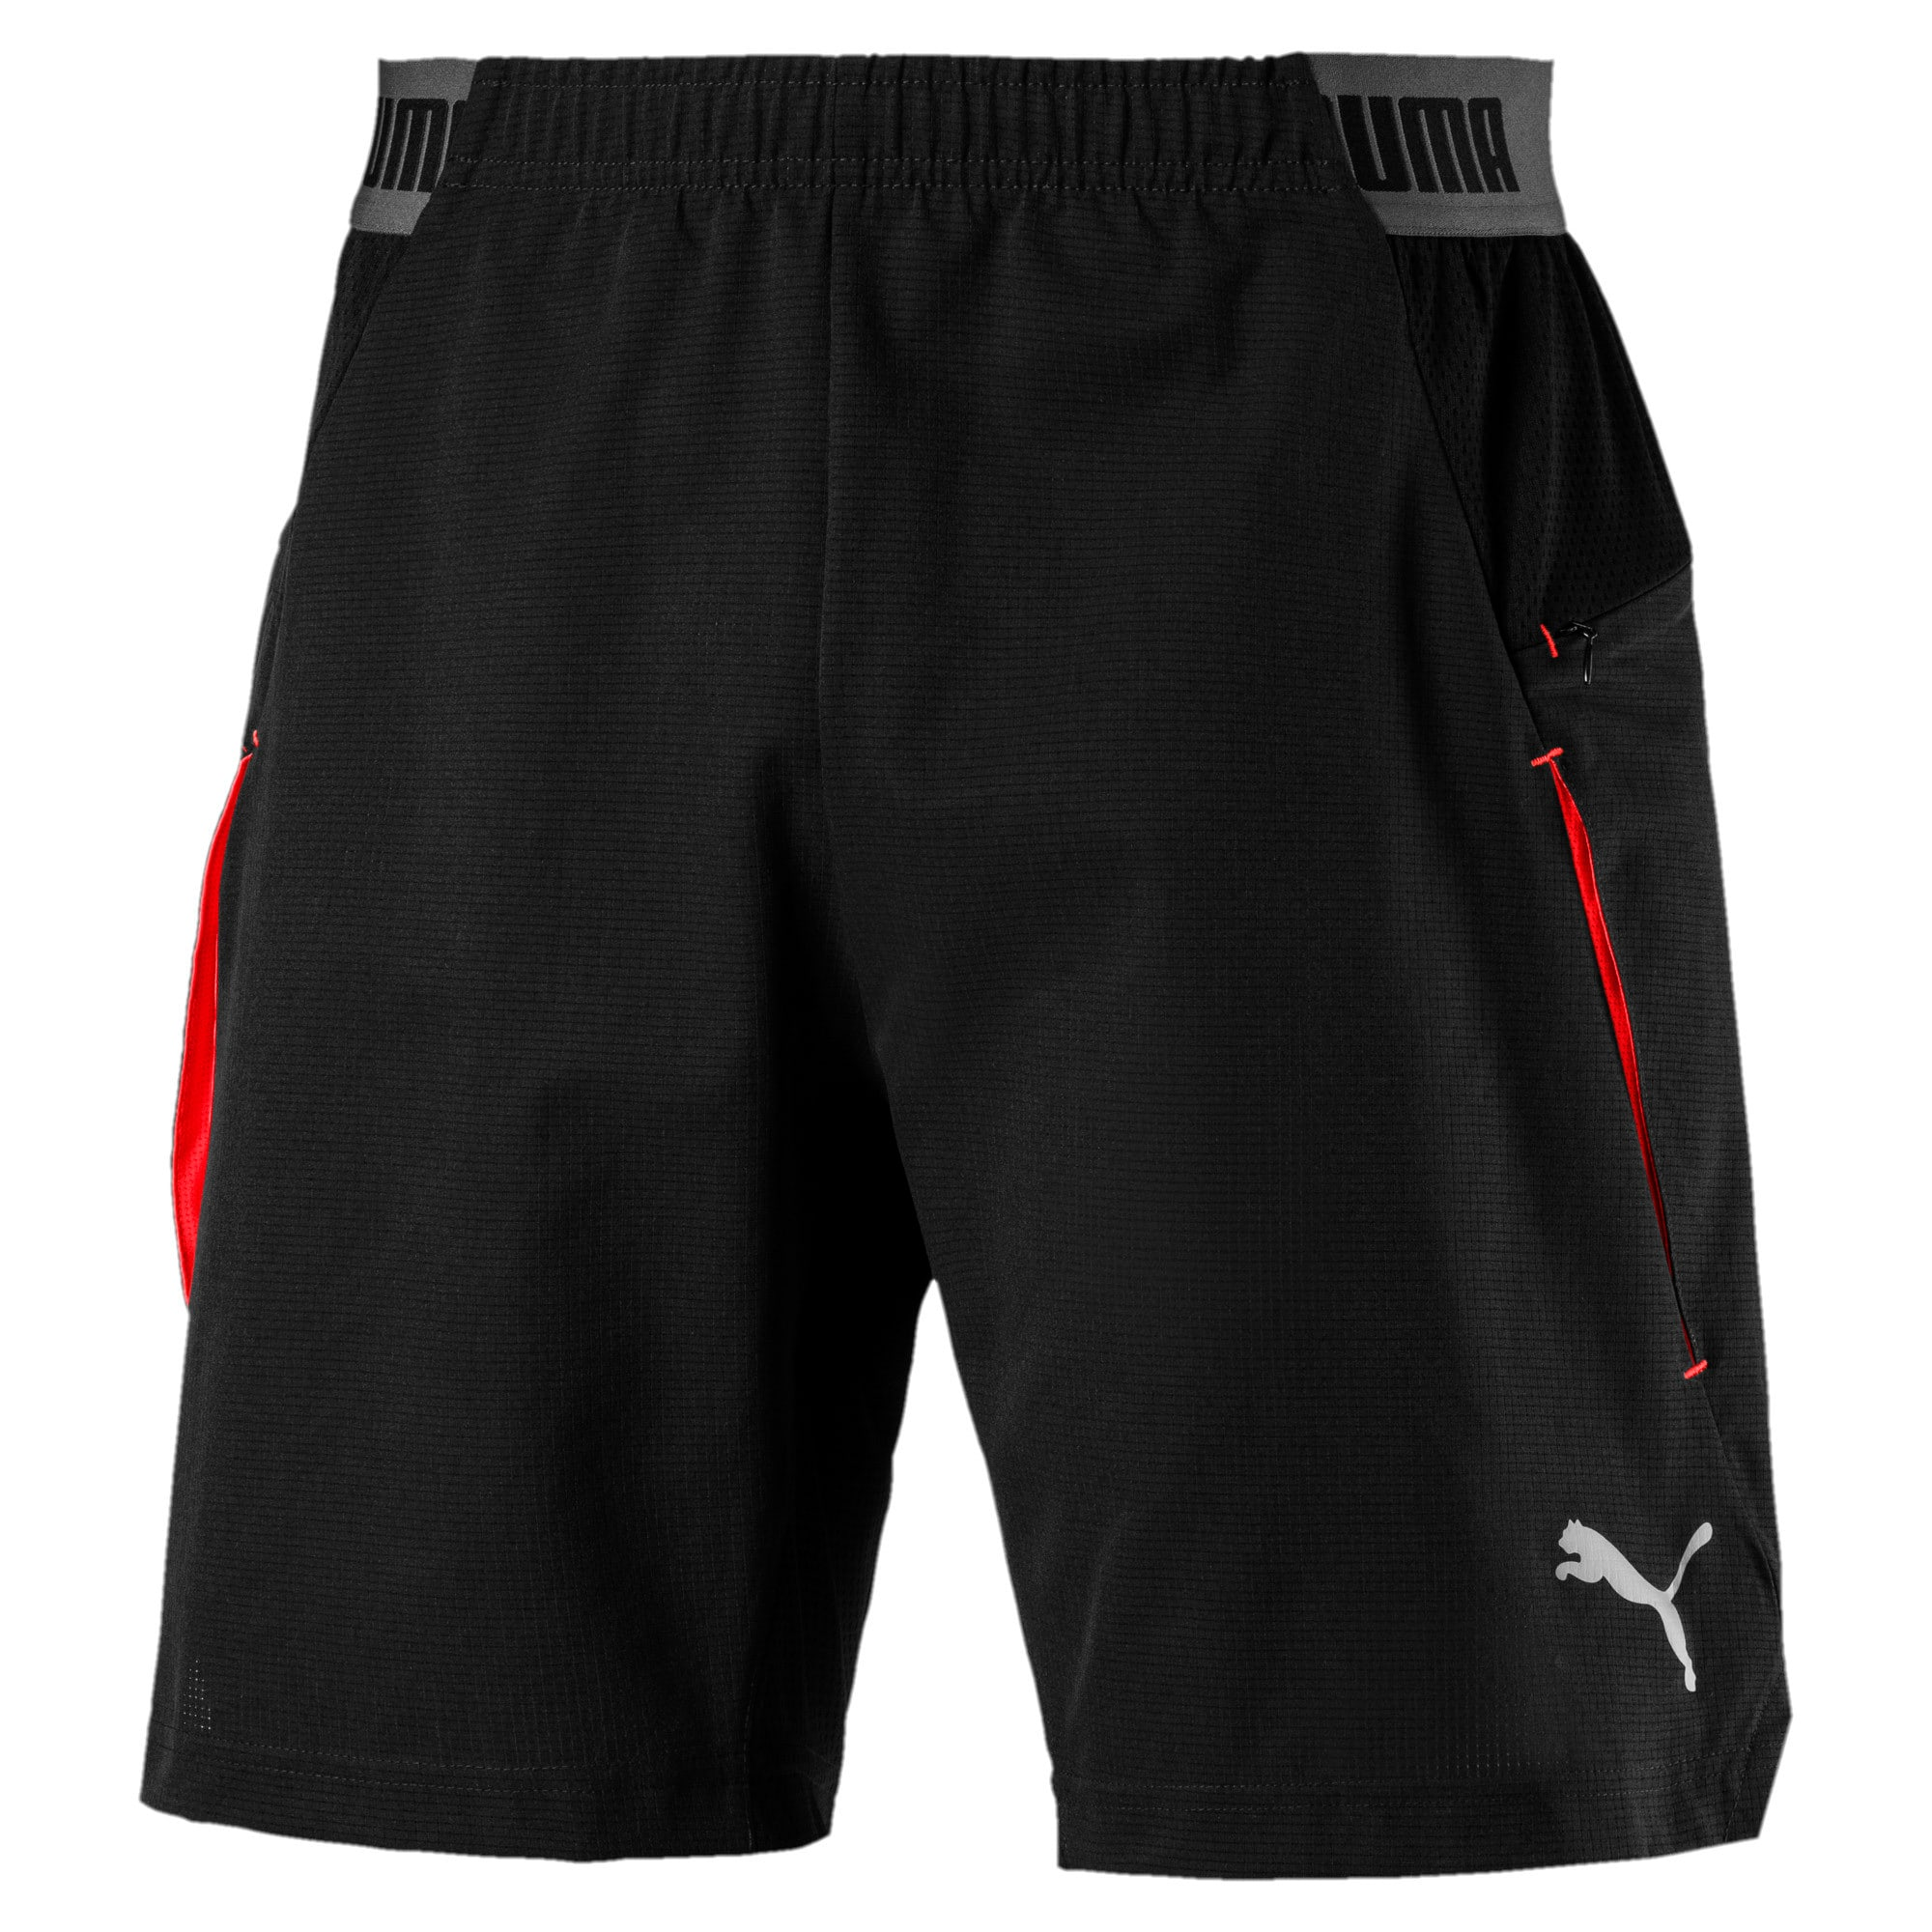 Thumbnail 5 of ftblNXT Pro Men's Shorts, Puma Black-Red Blast, medium